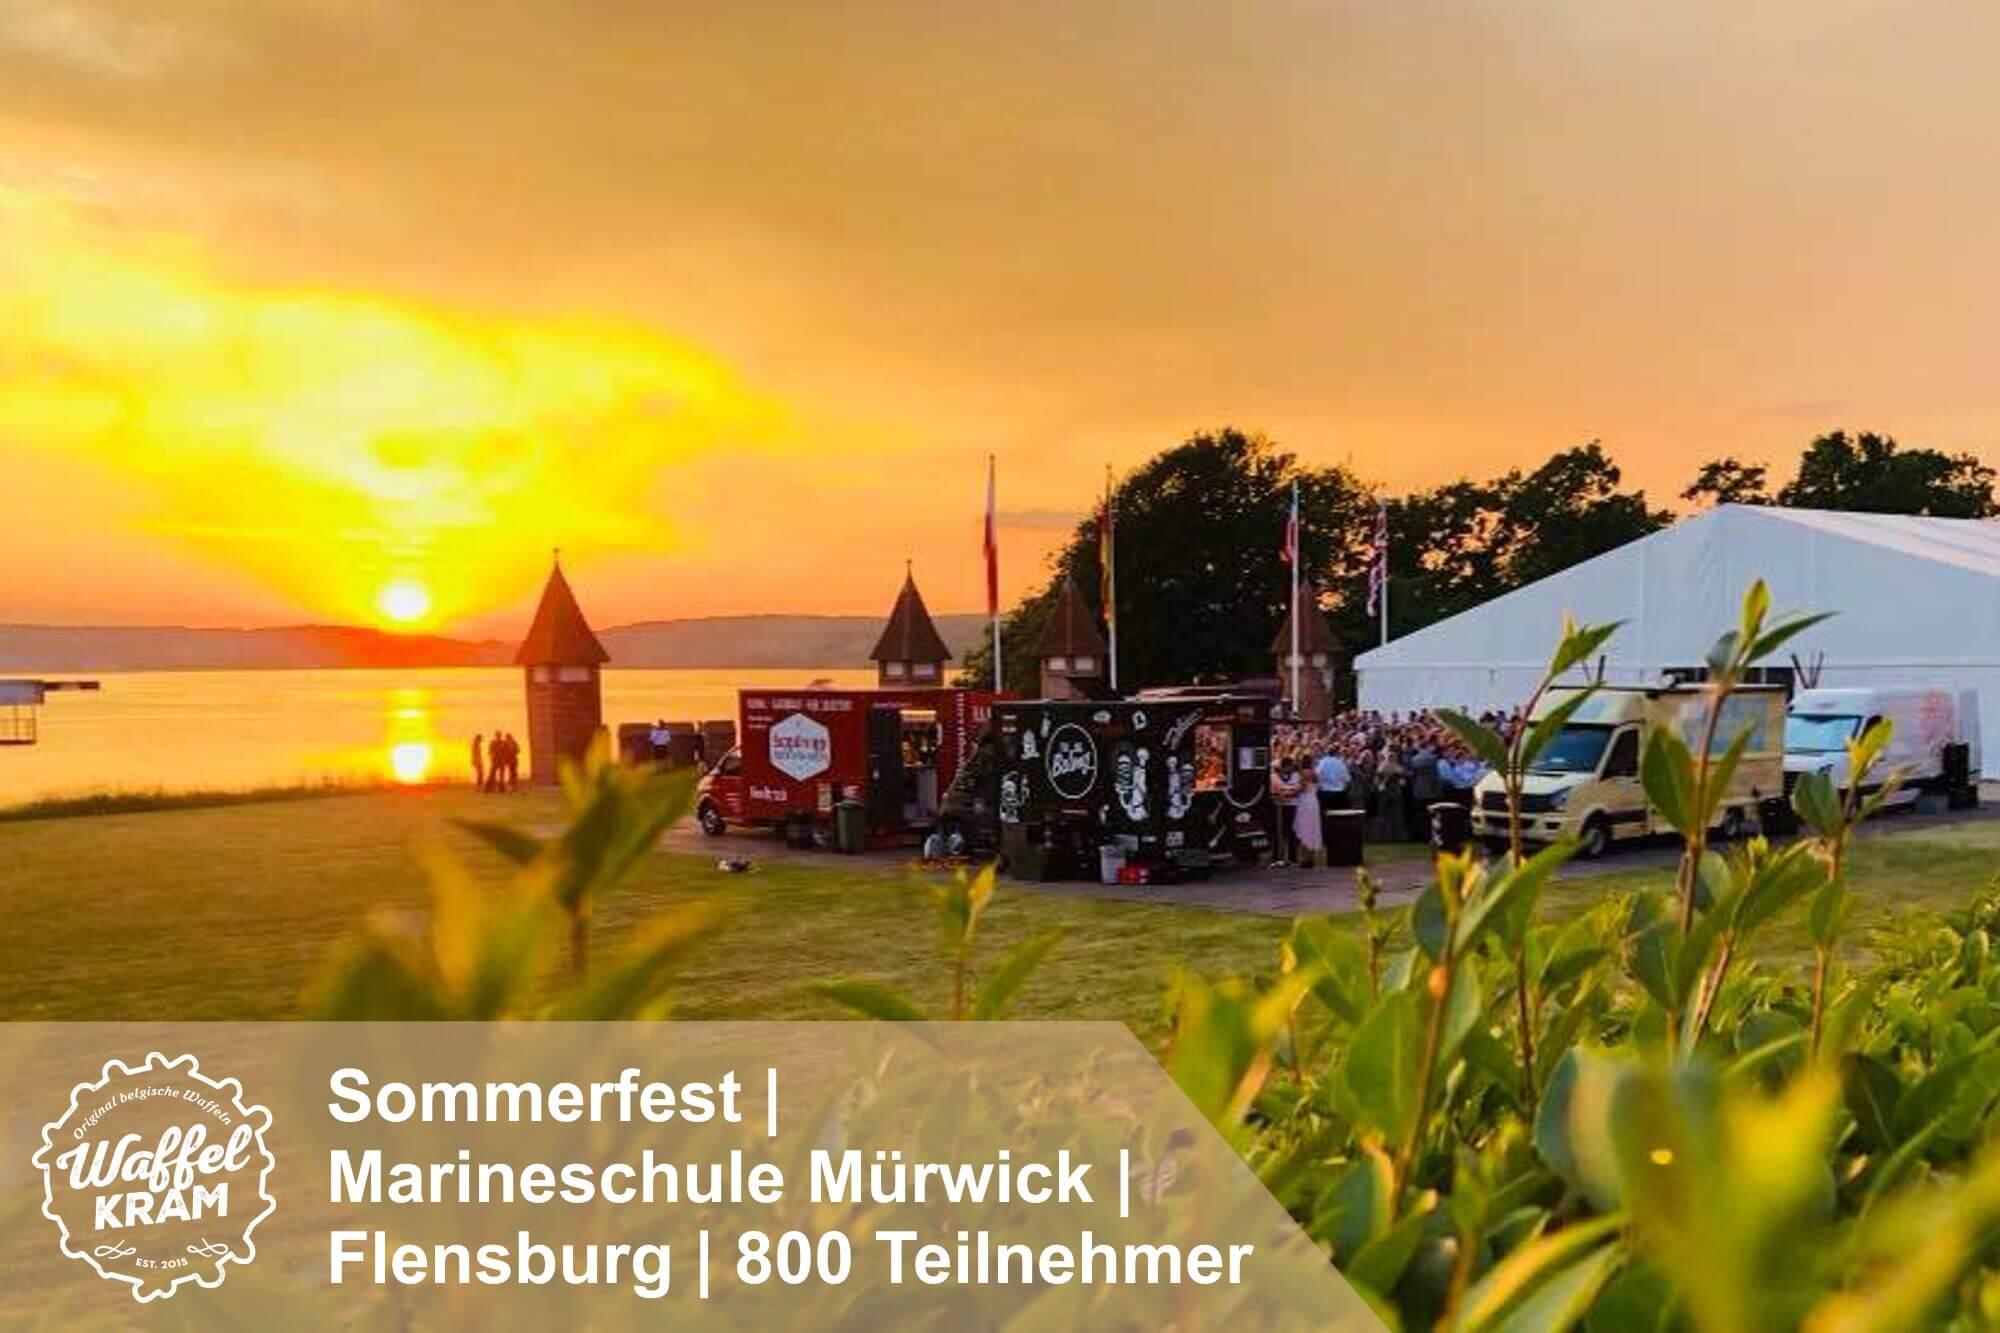 catering-sommerfest-marineschule-muerwick-flensburg-1tx